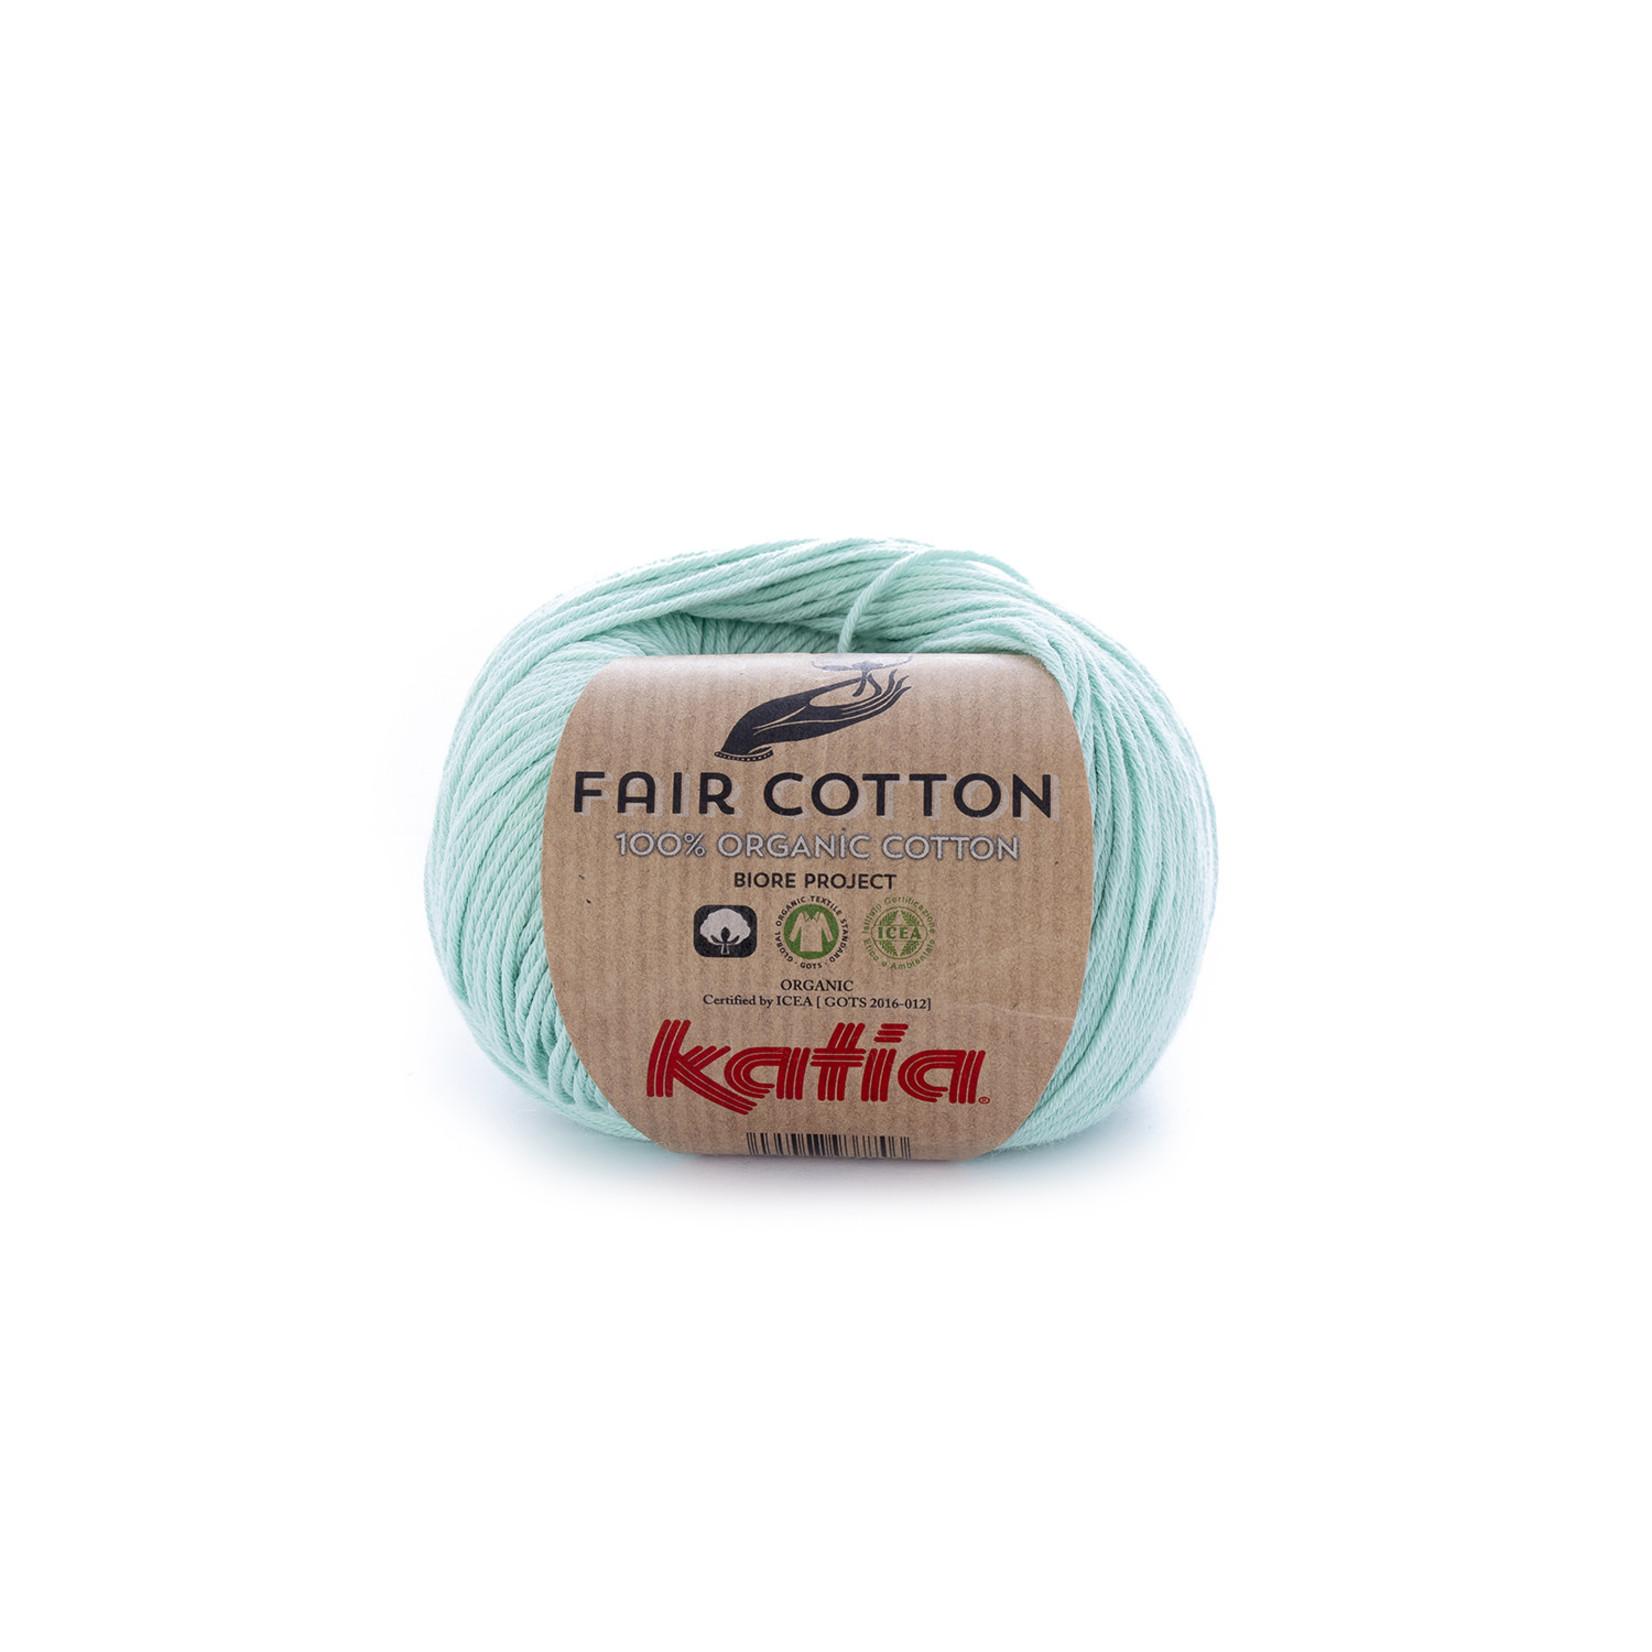 Katia Katia Fair Cotton 29 - witgroen - 1 bol = 50 gr. = 155 m. - 100% biol. katoen